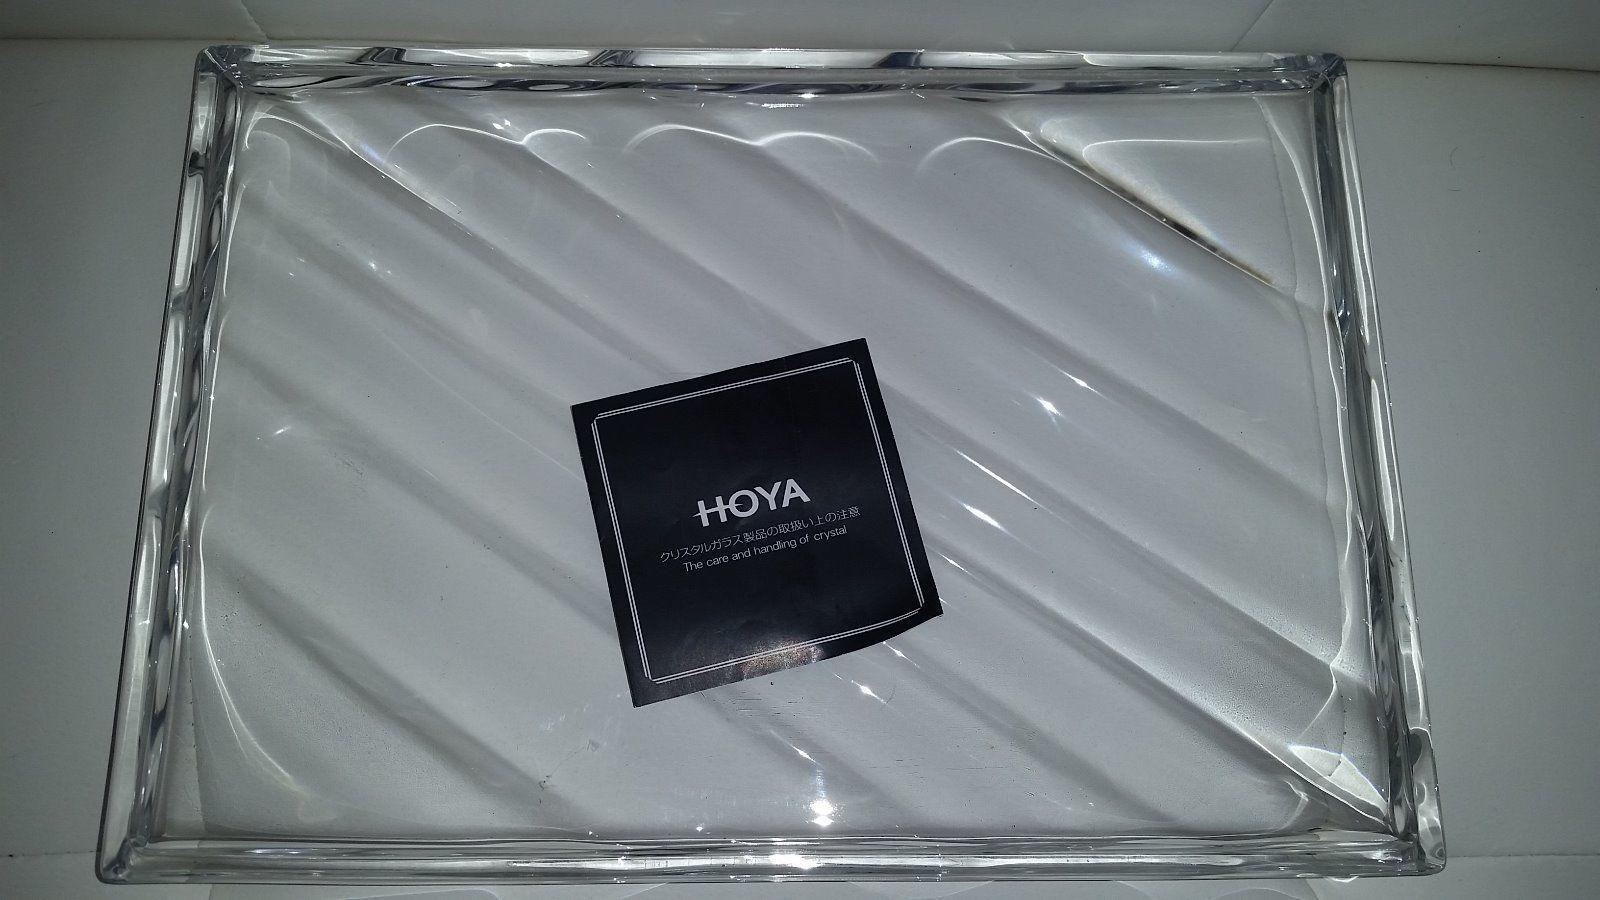 hoya crystal vase of nib hoya crystal small nut mint bowl dishes 1806702137 for hoya crystal platter nib